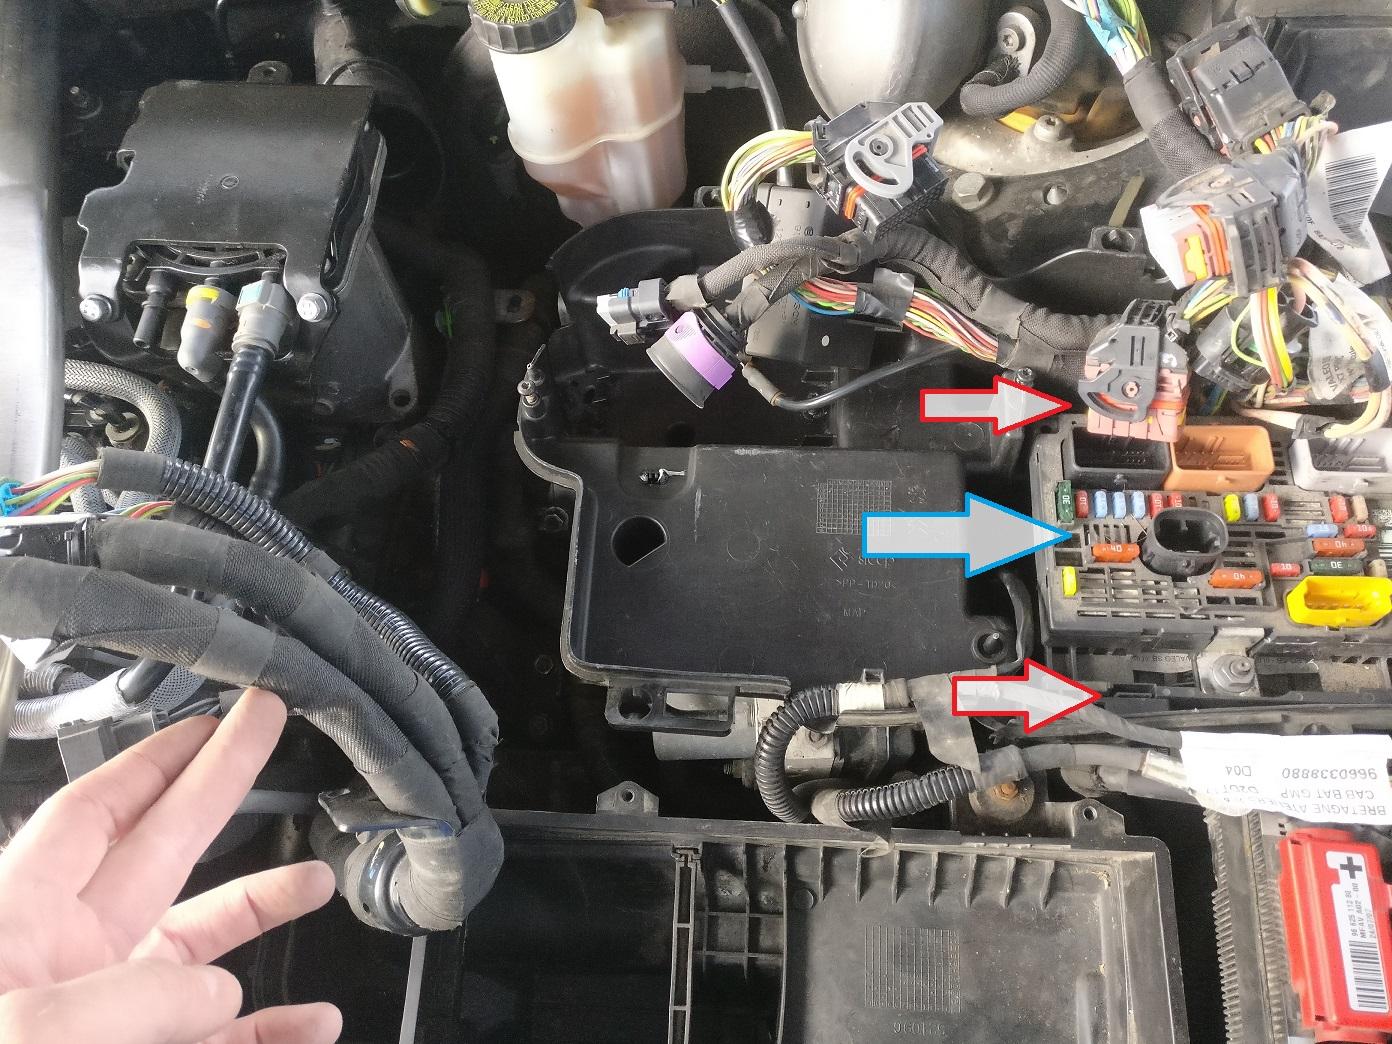 citroen c5 suspension pump wiring diagram 22re ecu fuse box problems library